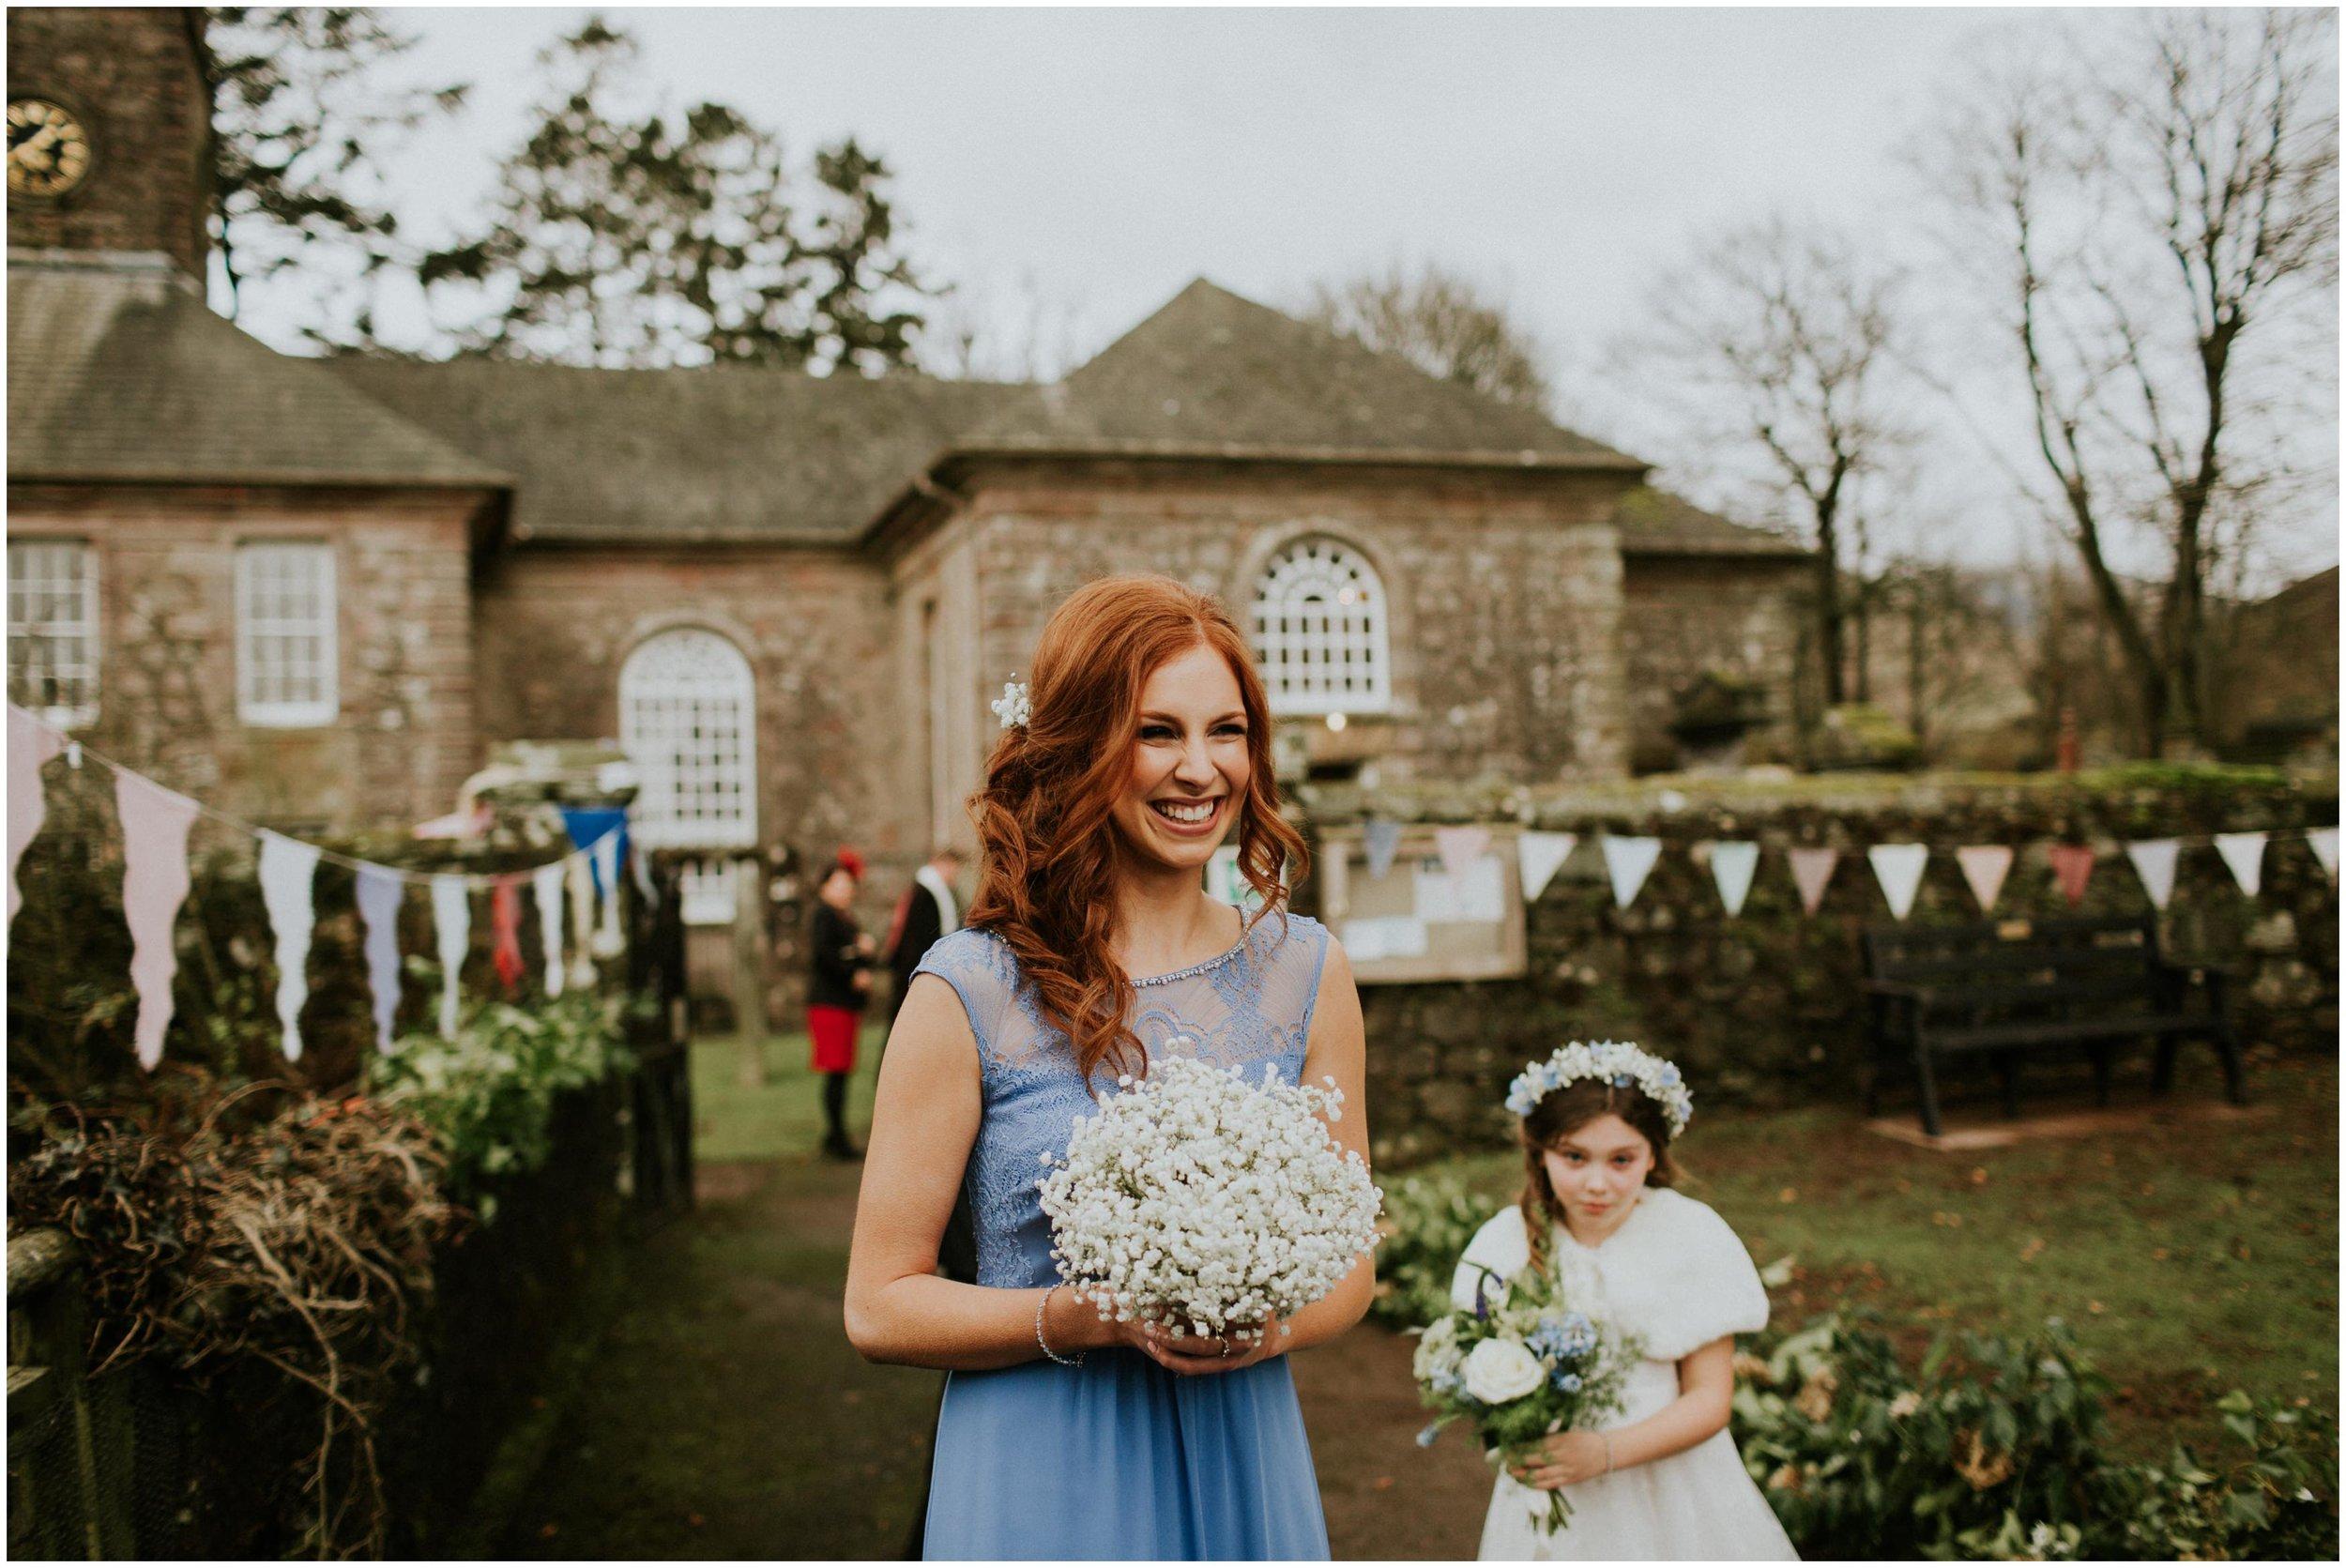 Photography 78 - Glasgow Wedding Photographer - Dave & Alana_0027.jpg